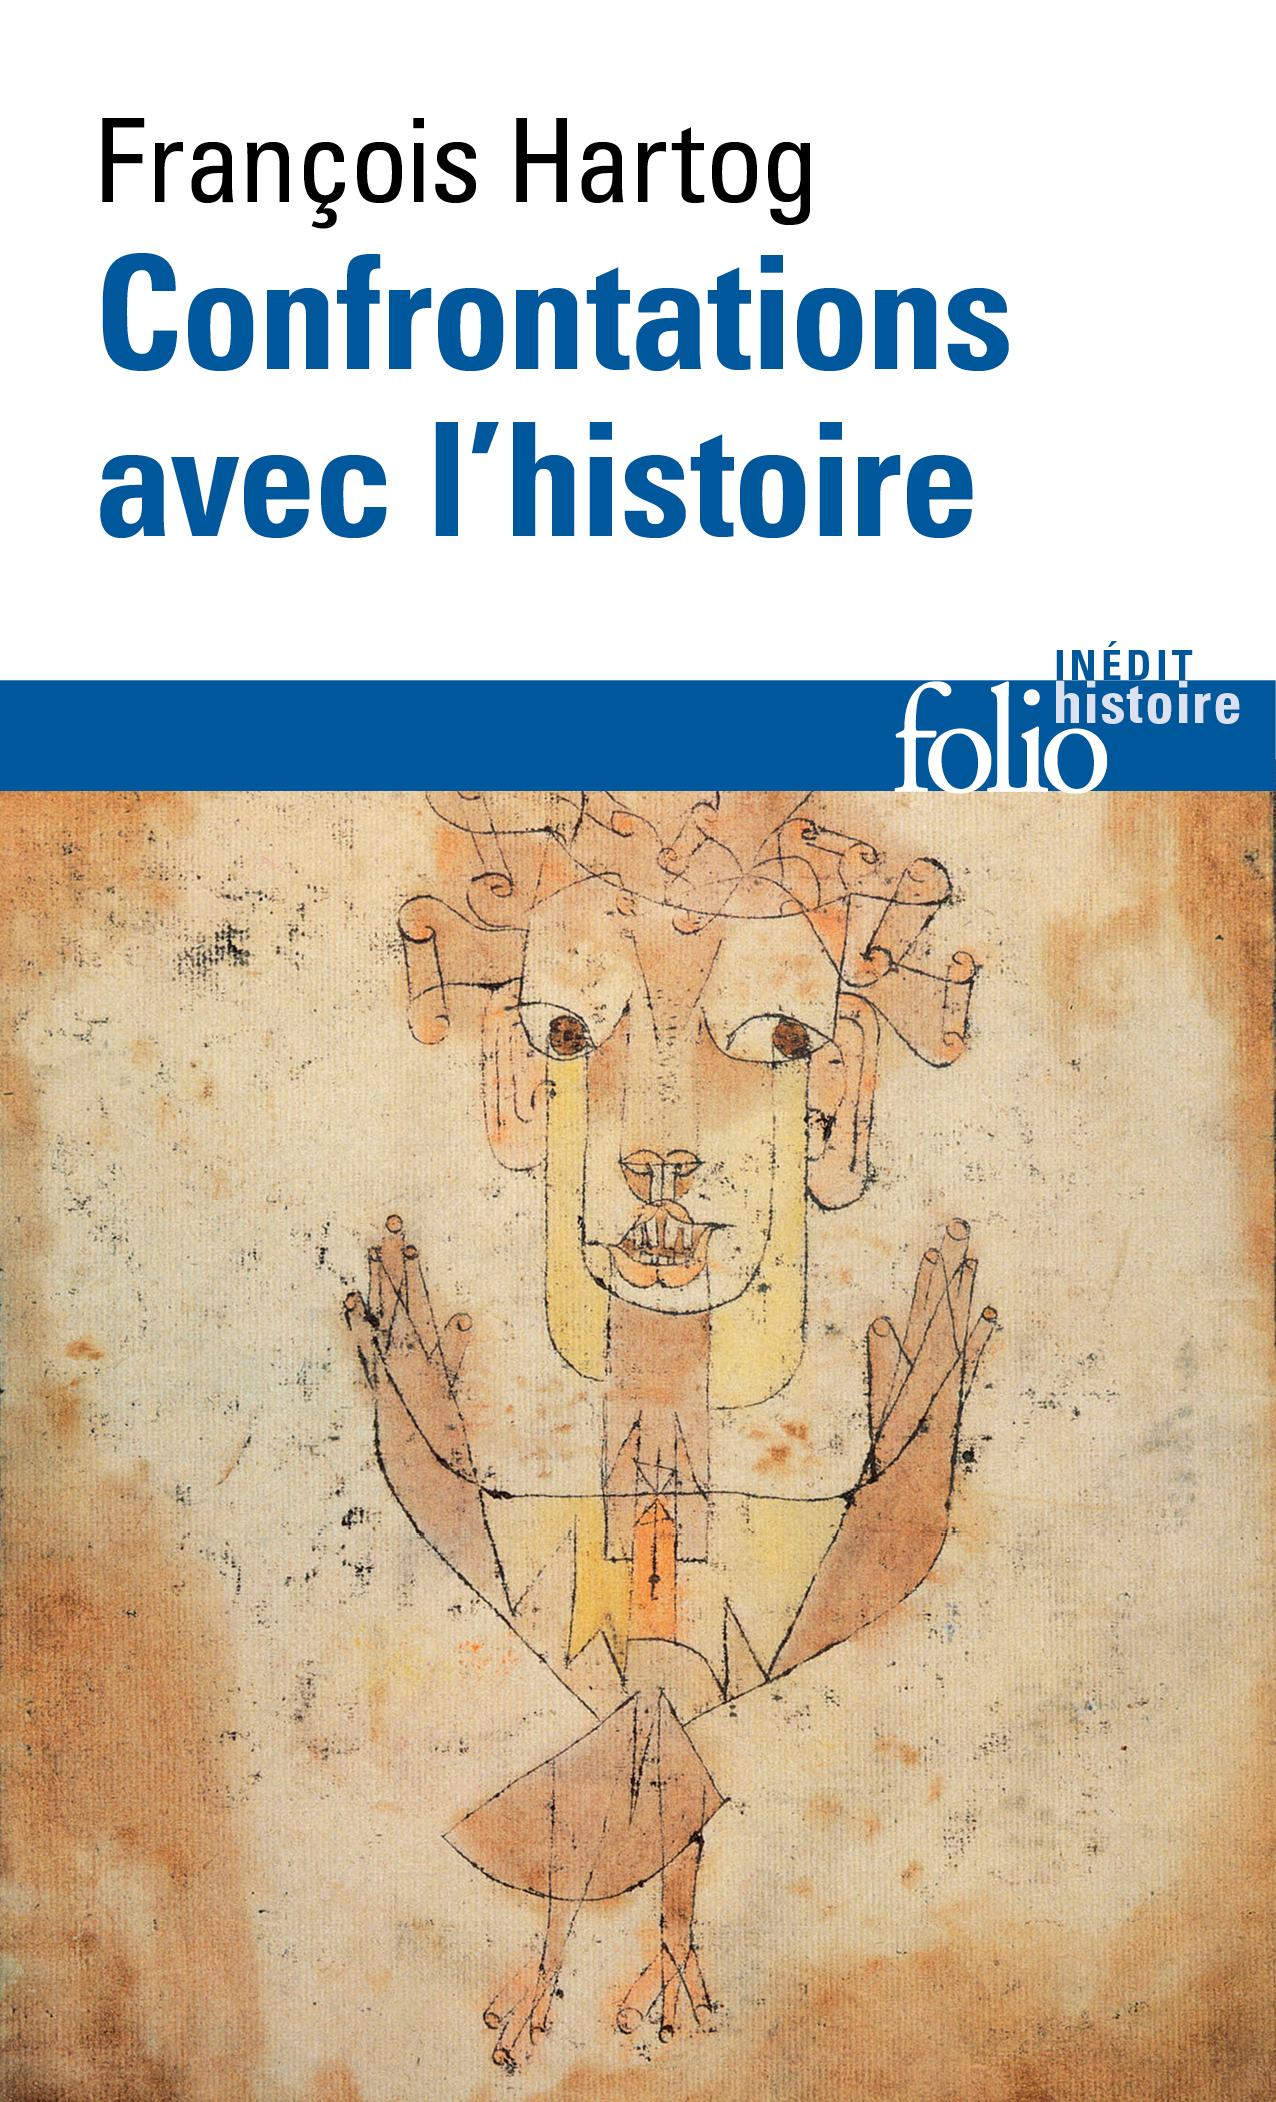 Hartog, la poésie et l'Histoire